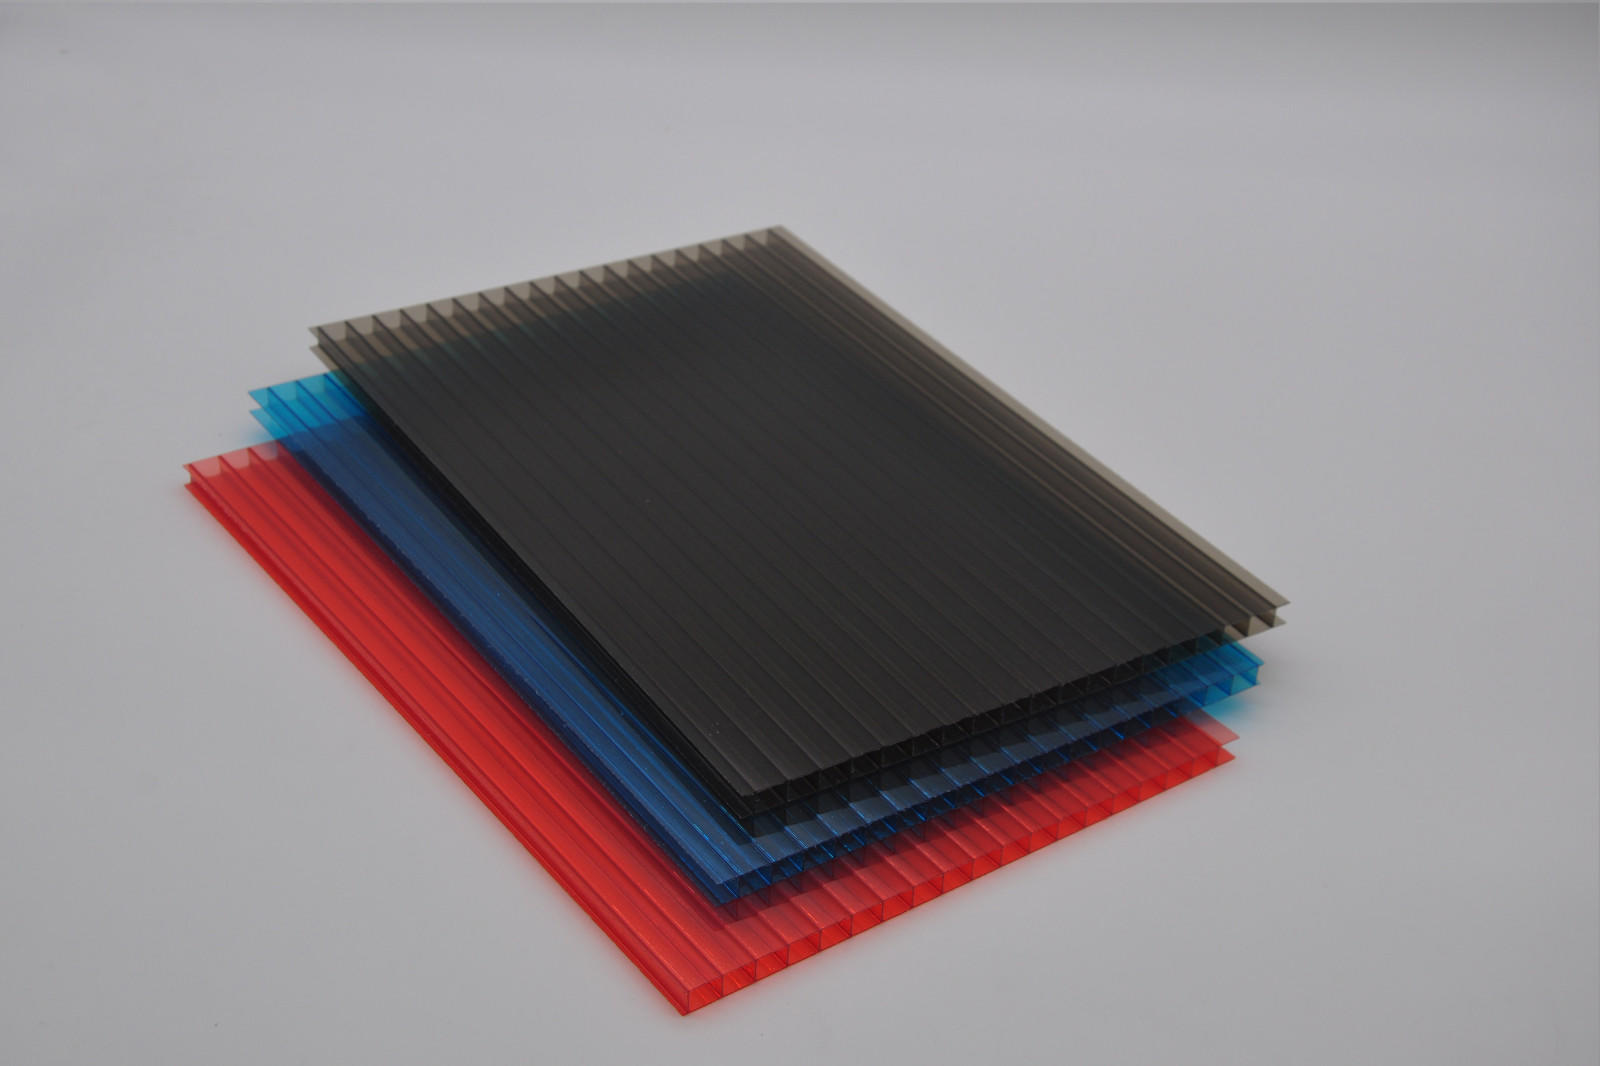 GWX uv protective polycarbonate pc sheet factory direct for Gazebo-2